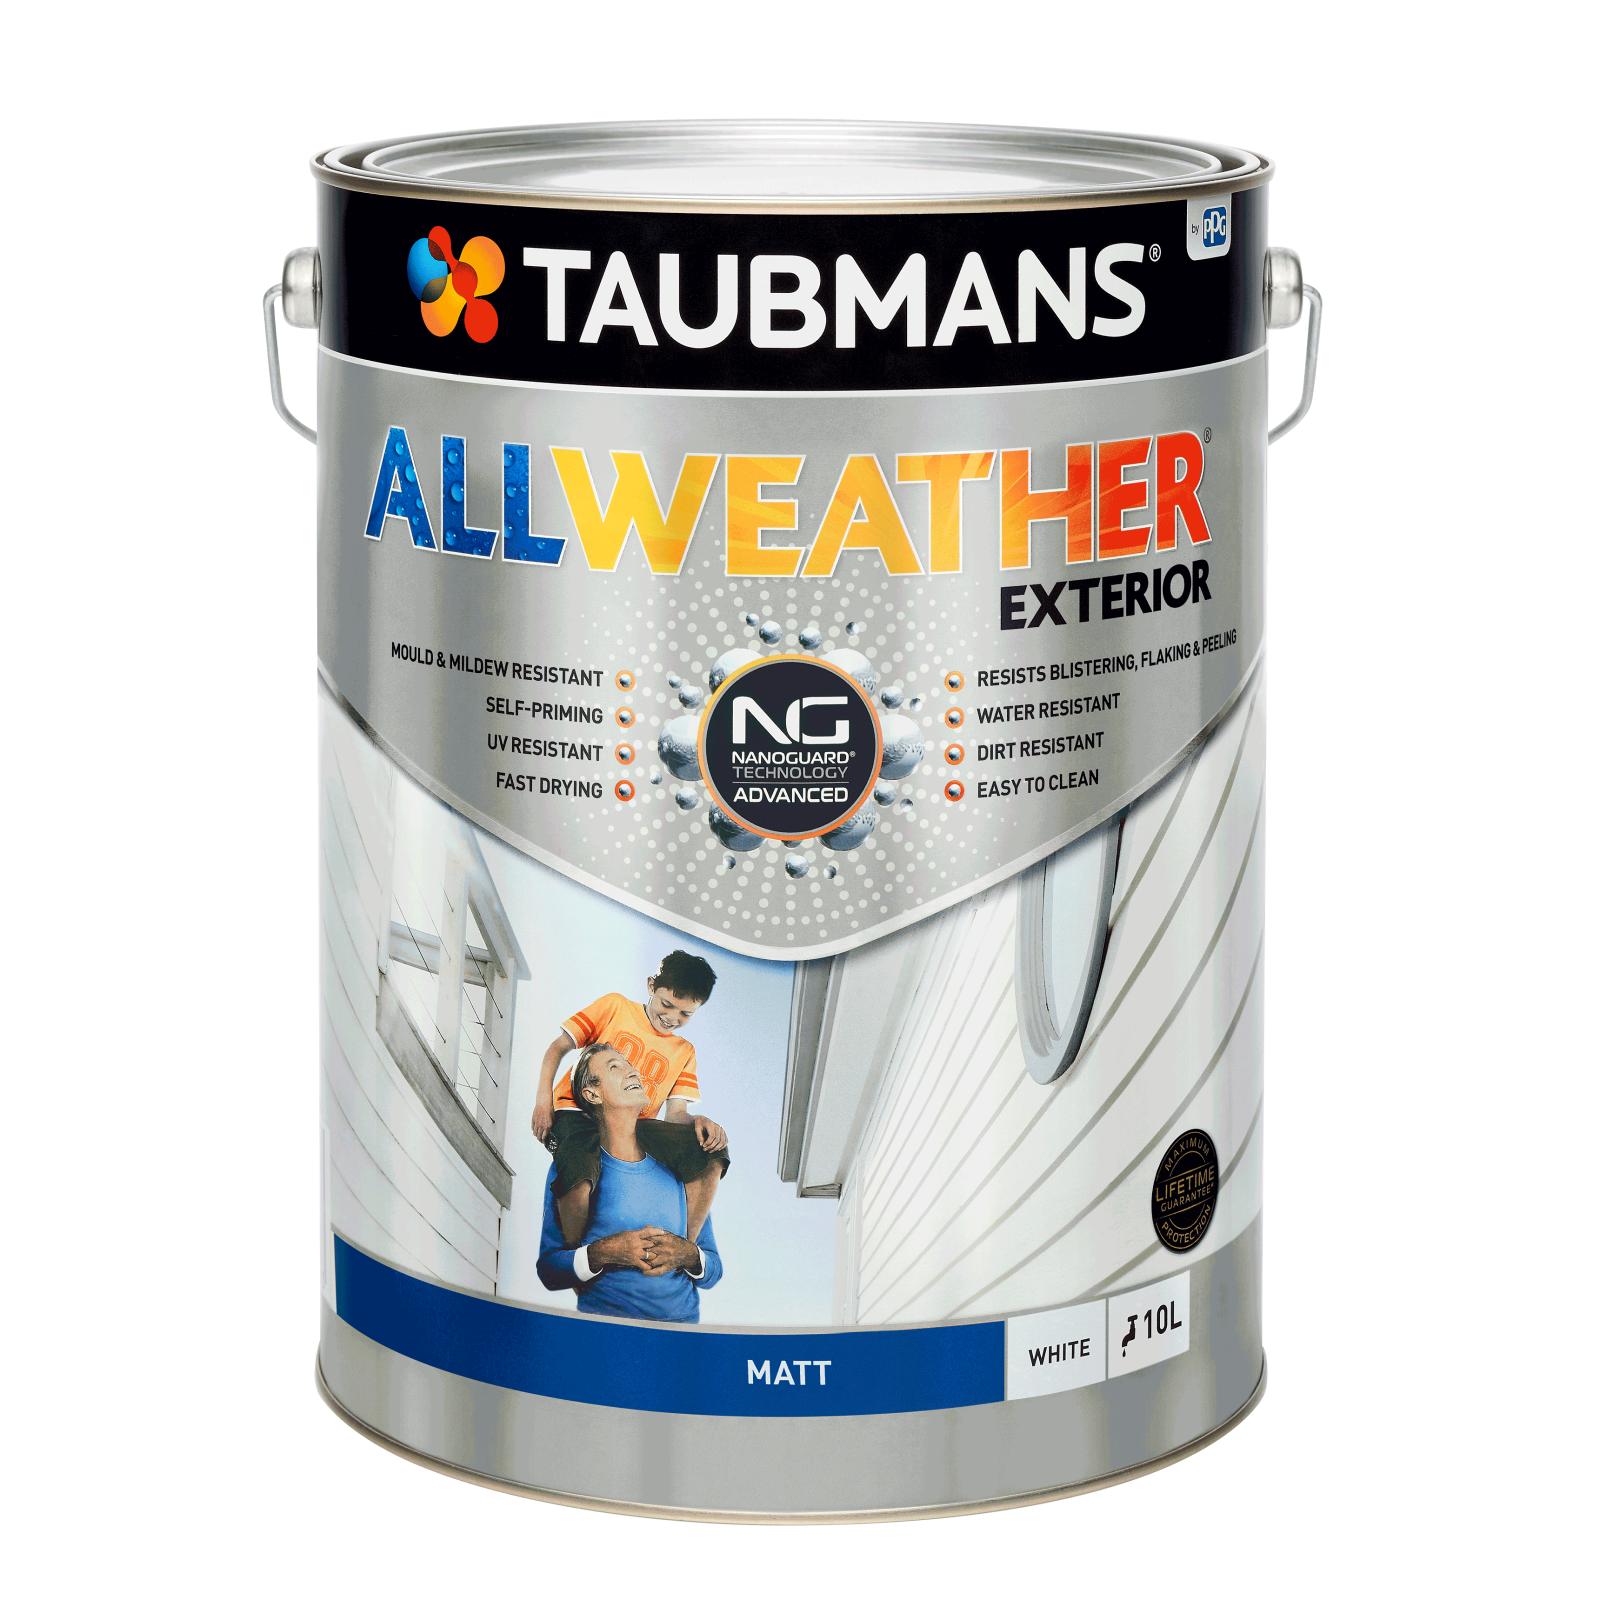 Taubmans All Weather Matt White Exterior Paint - 10L